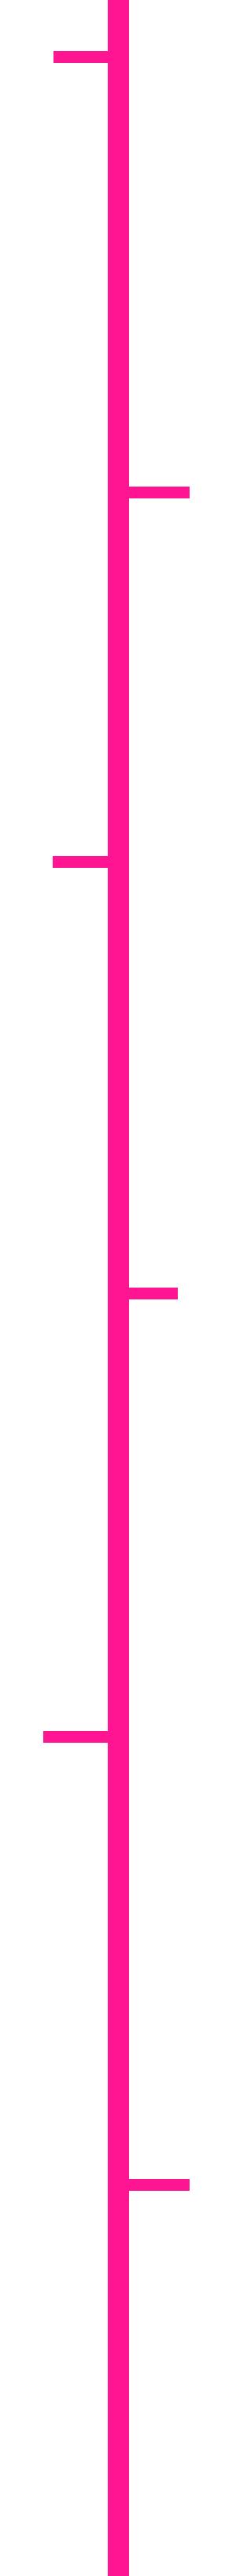 line-.png